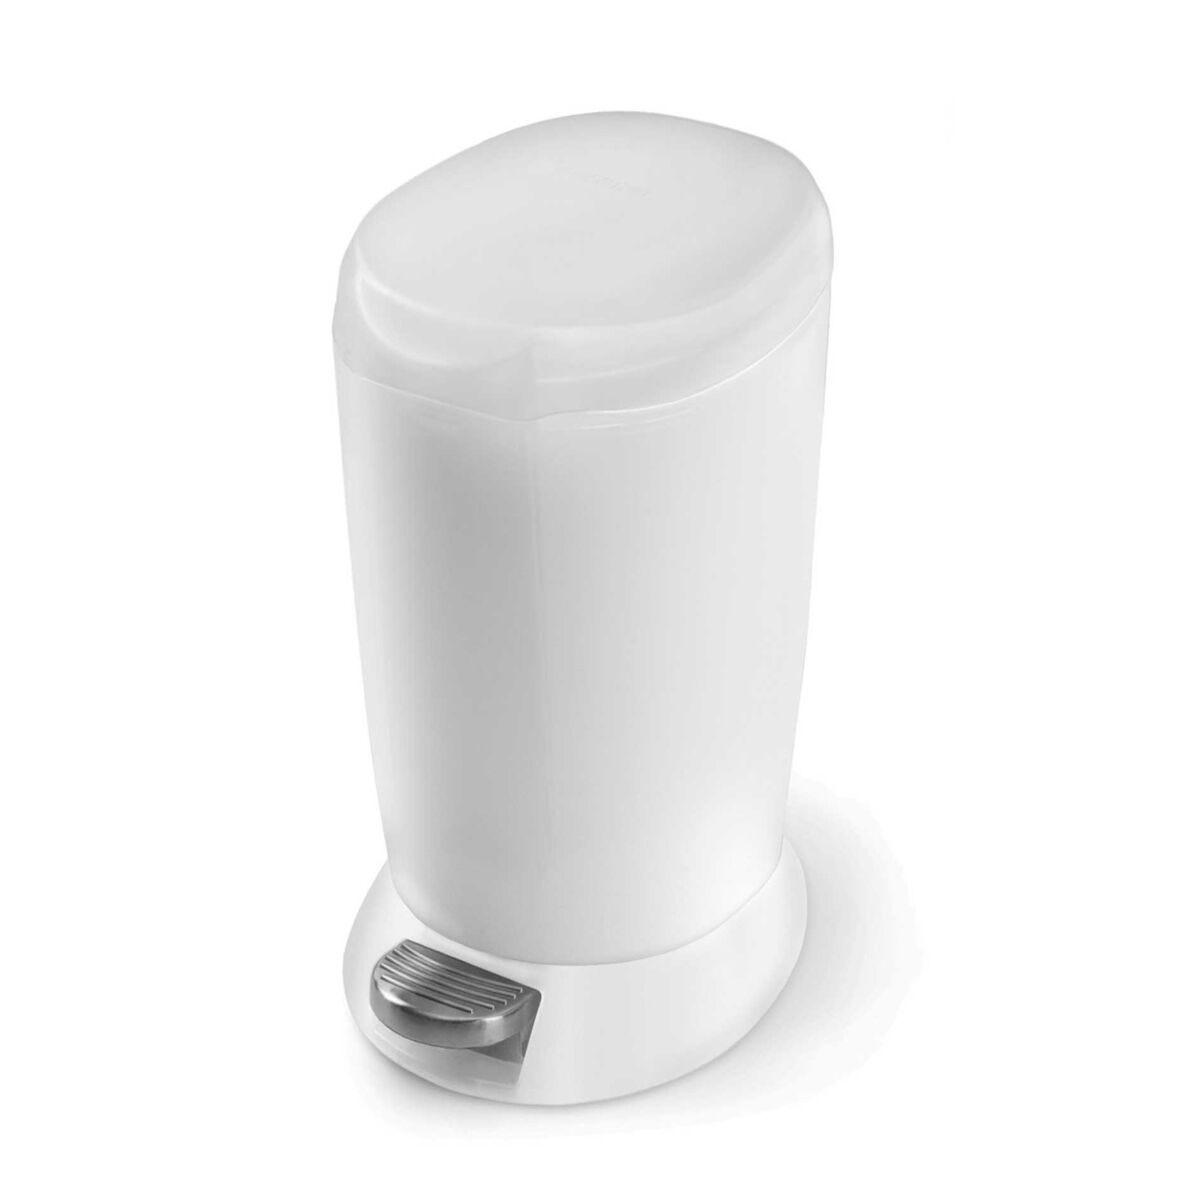 Simplehuman Round Plastic Pedal Bin 6 Litre